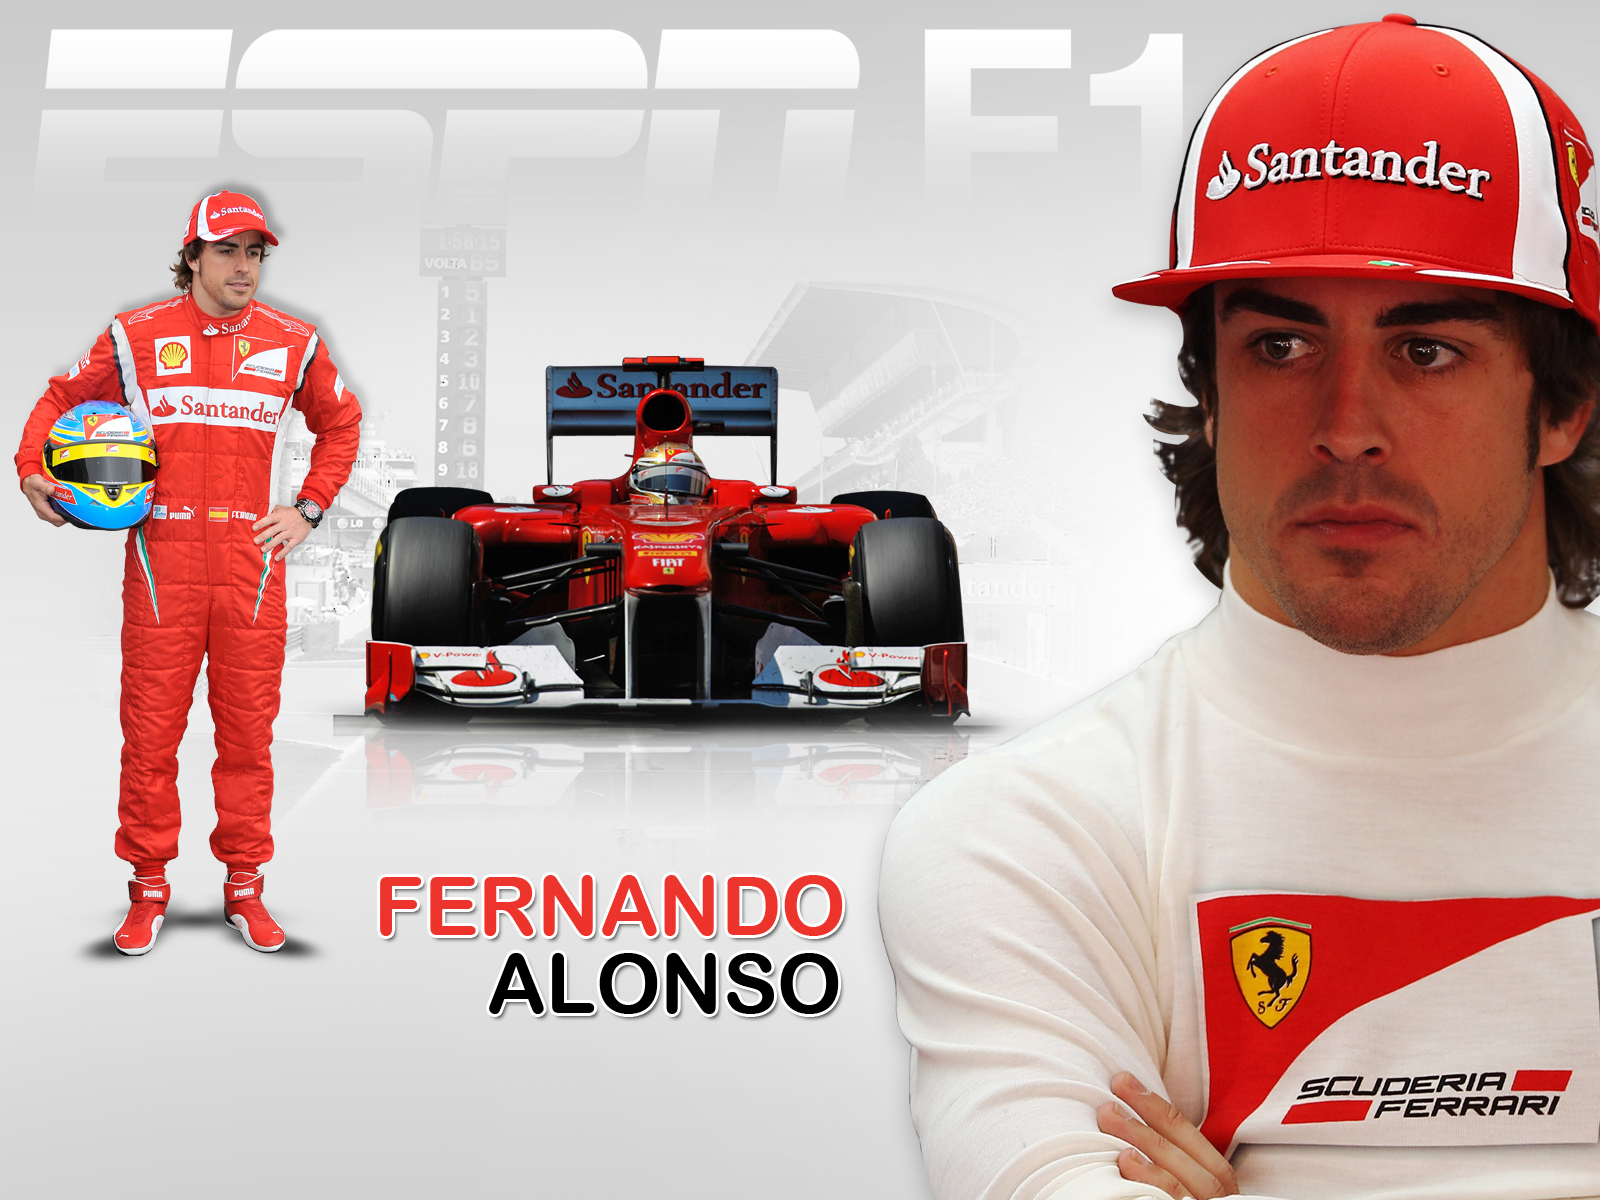 Fernando Alonso 2011